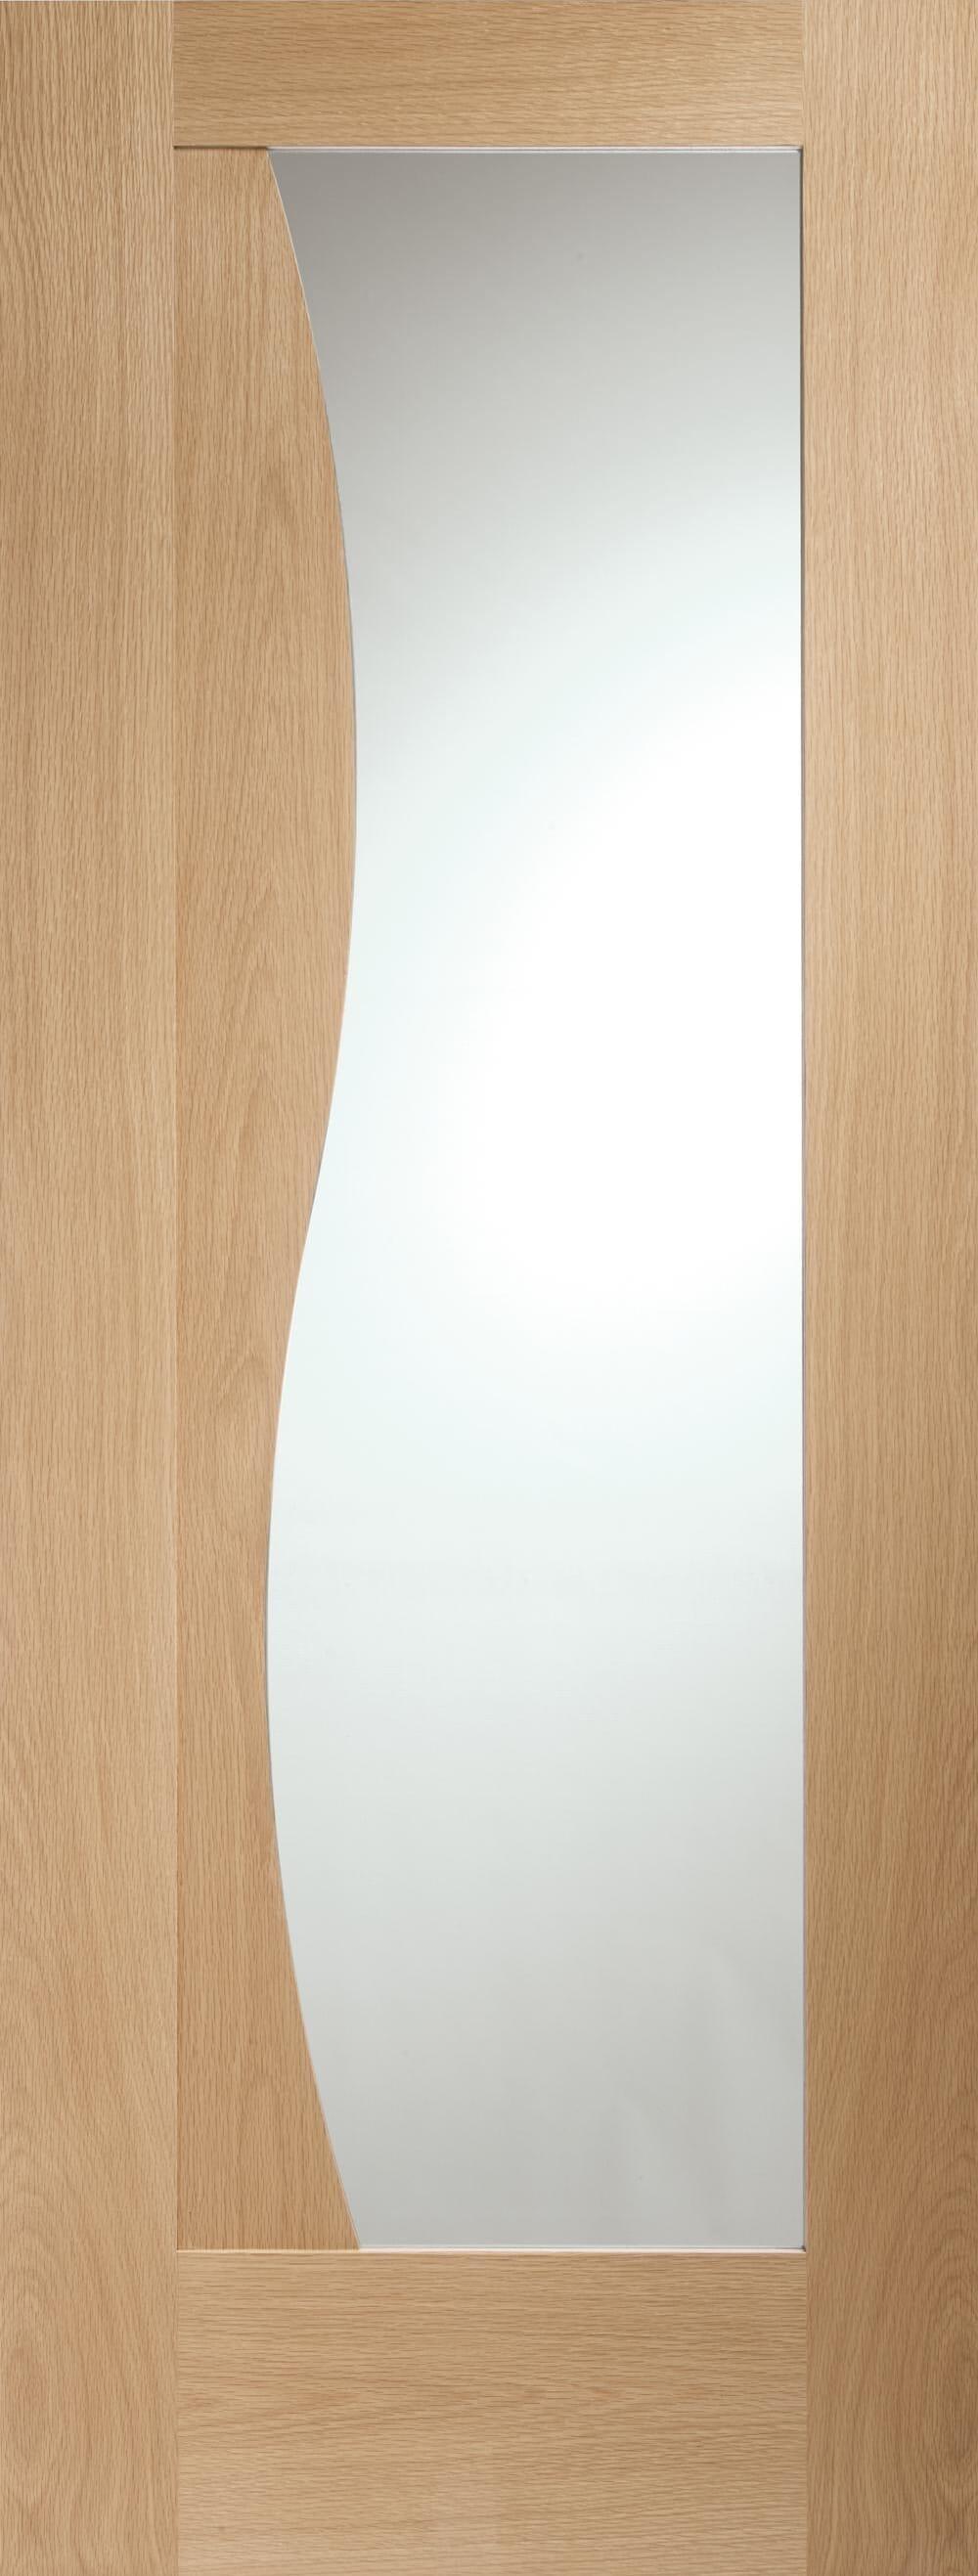 Emilia Oak Clear Glazed - Xl Joinery  Image